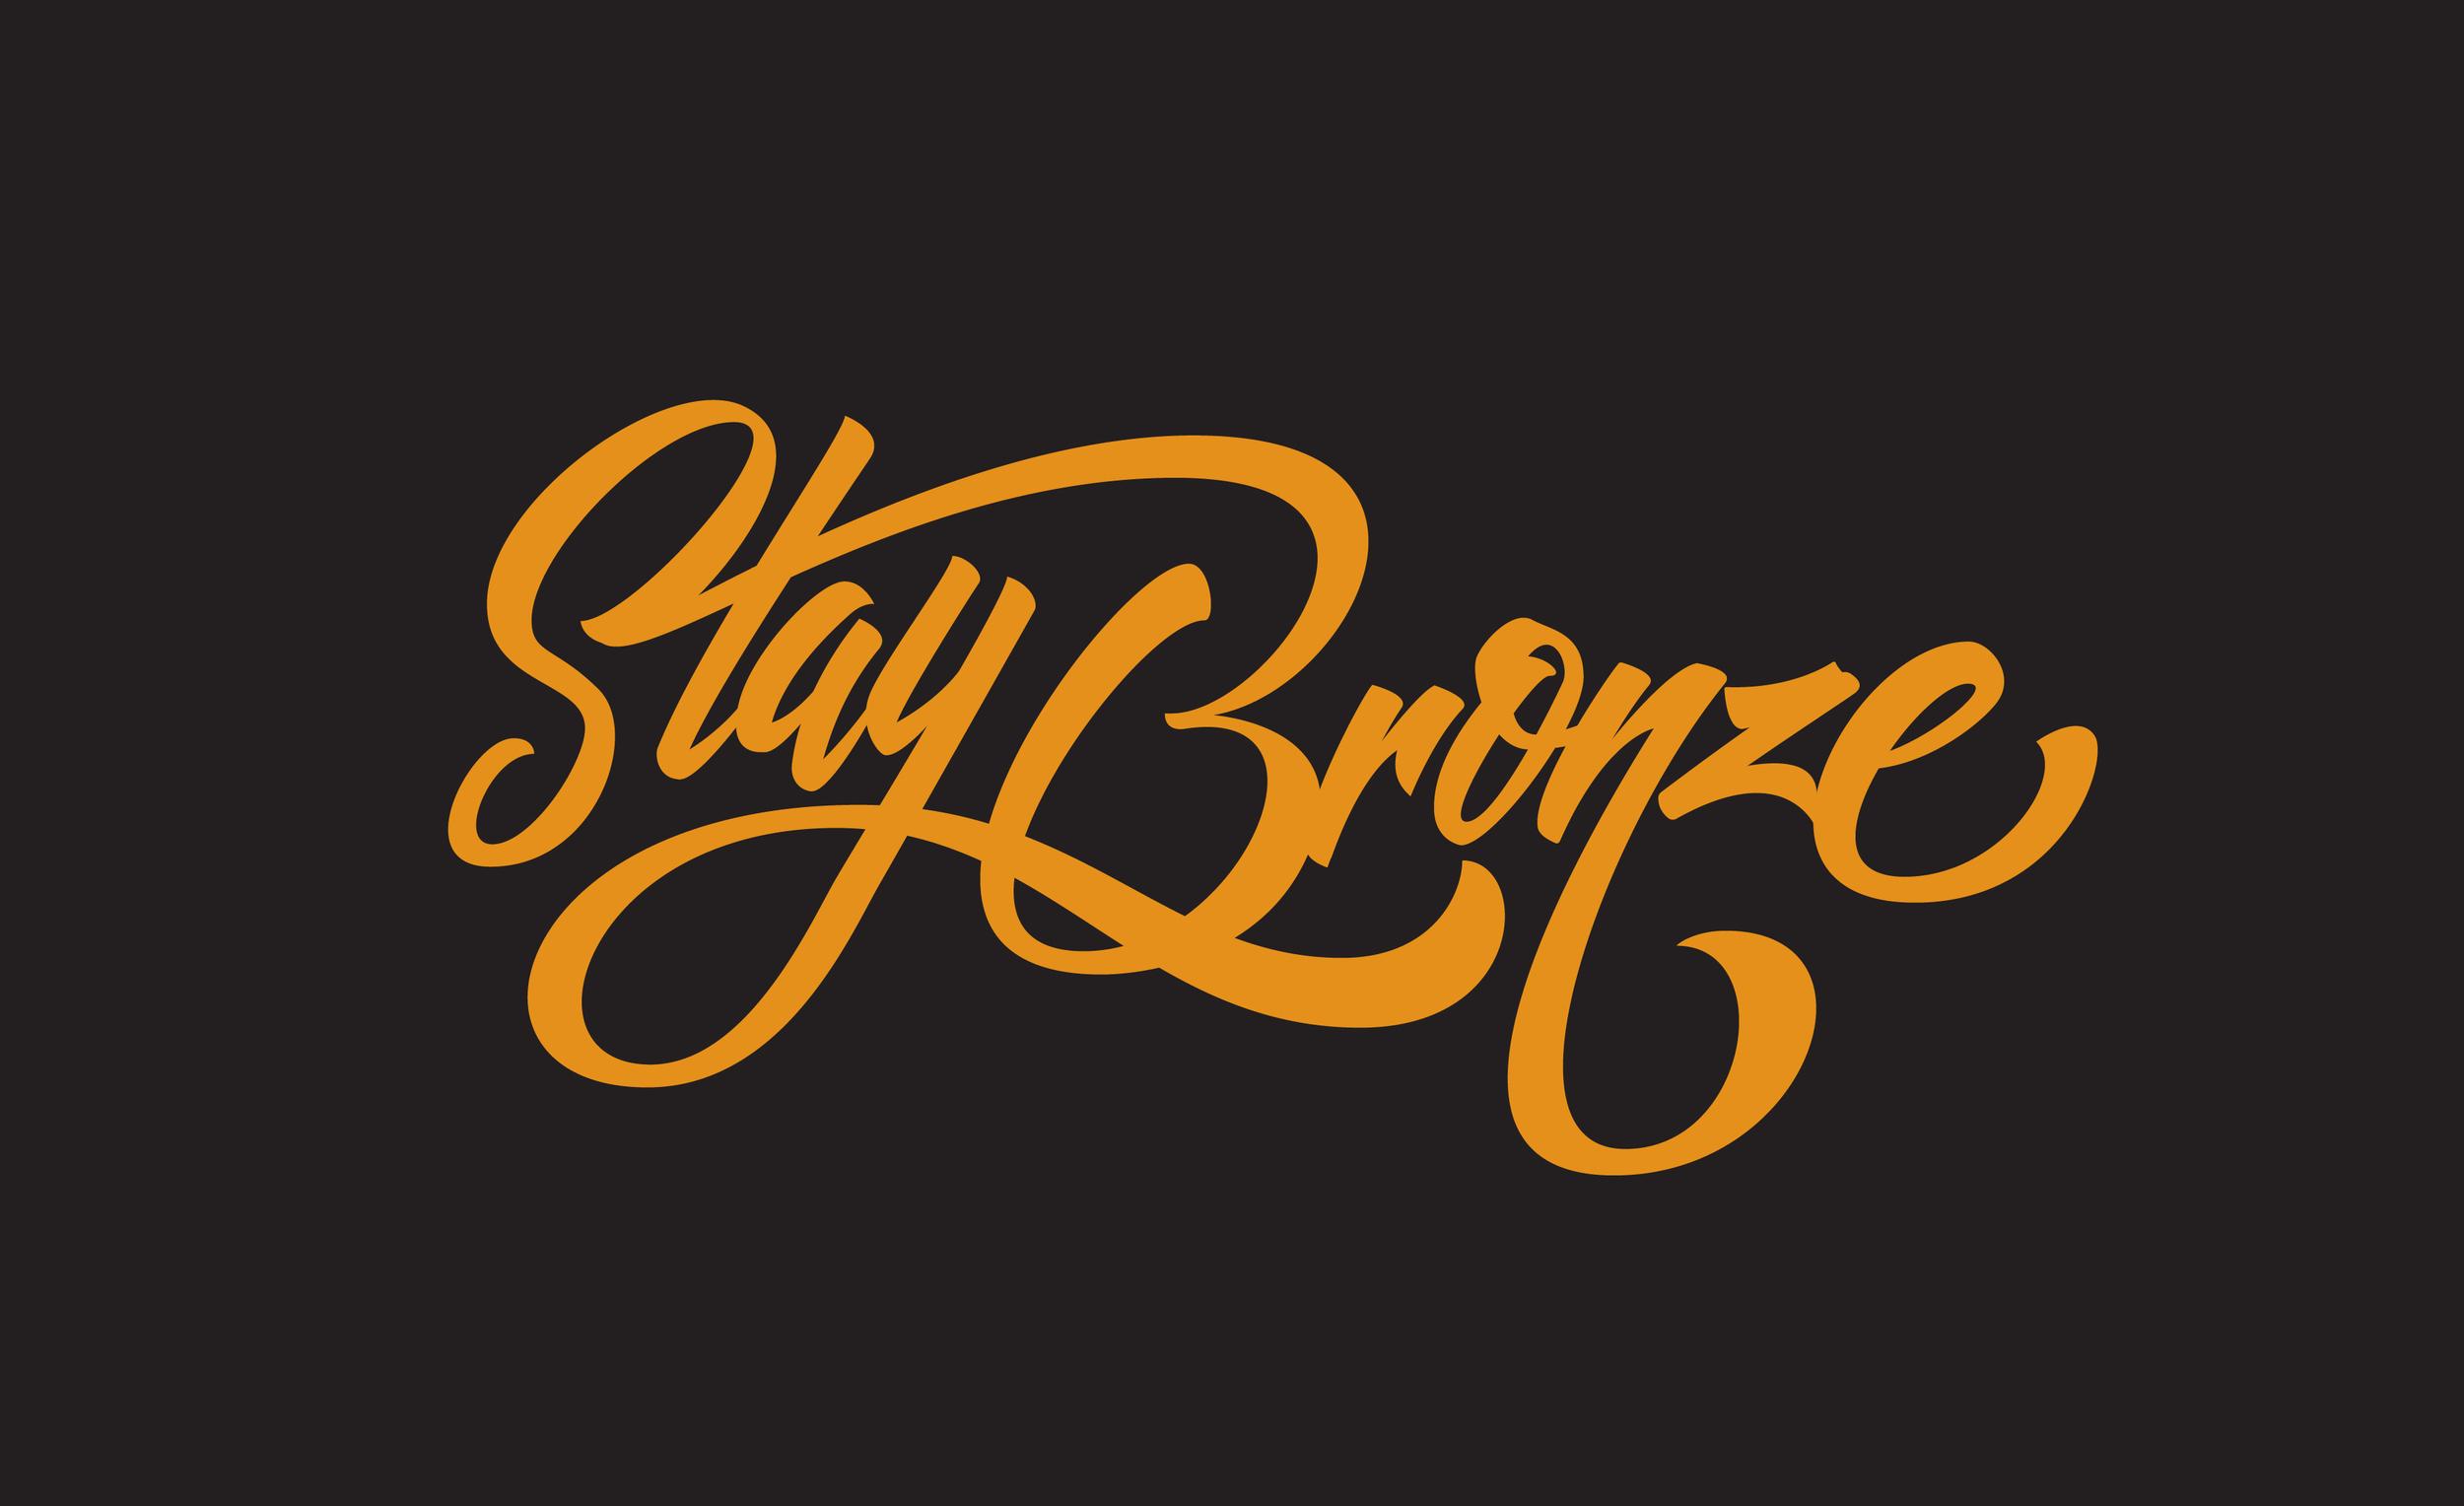 Stay Bronze